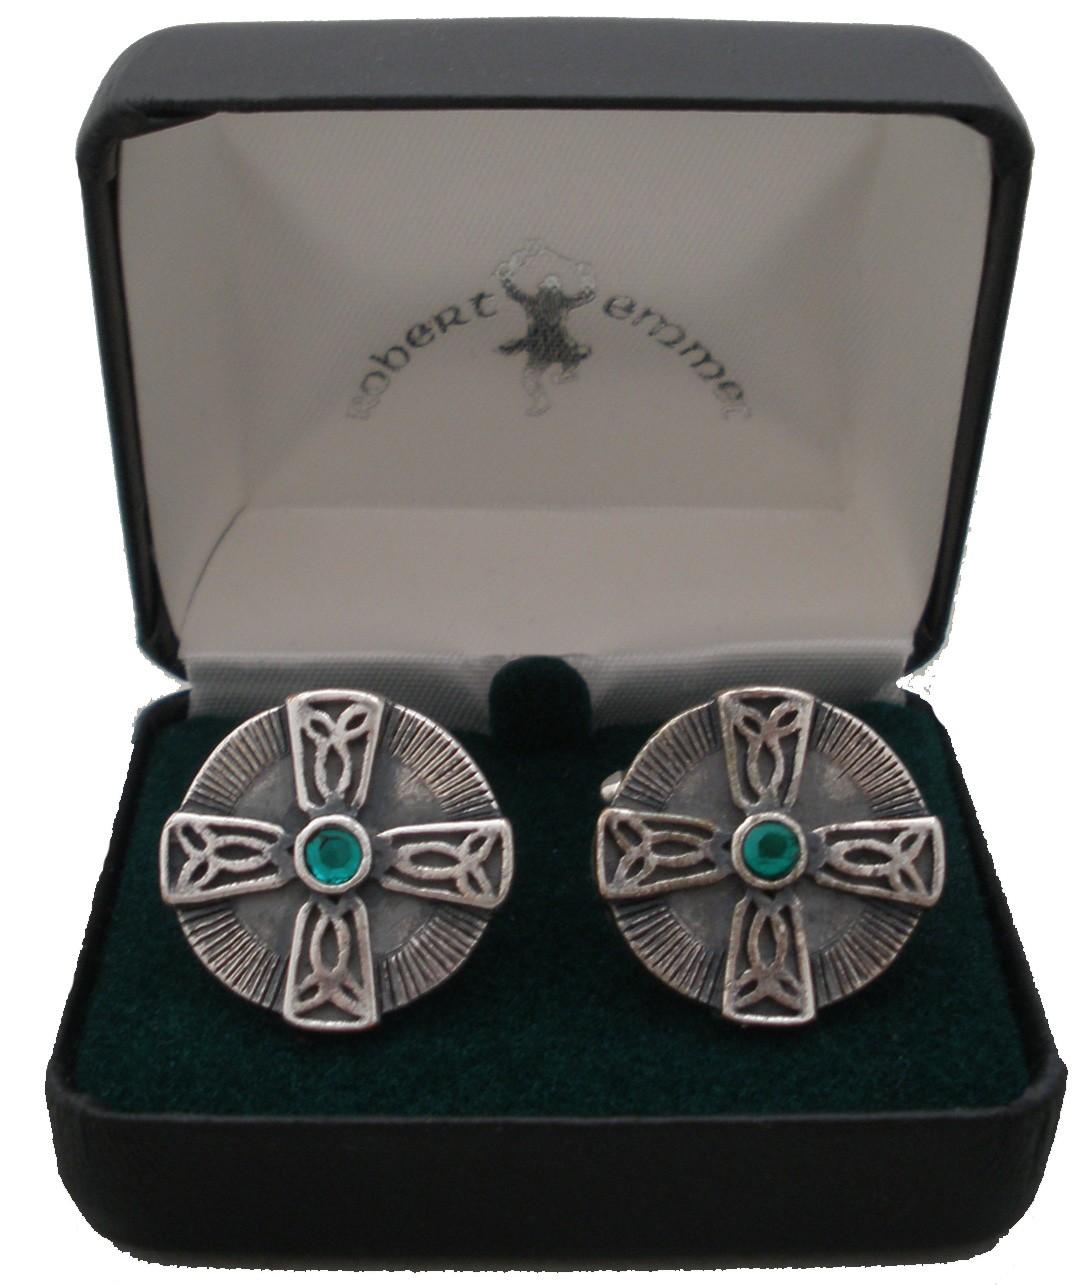 Celtic Cross Cuff Links Green Stone